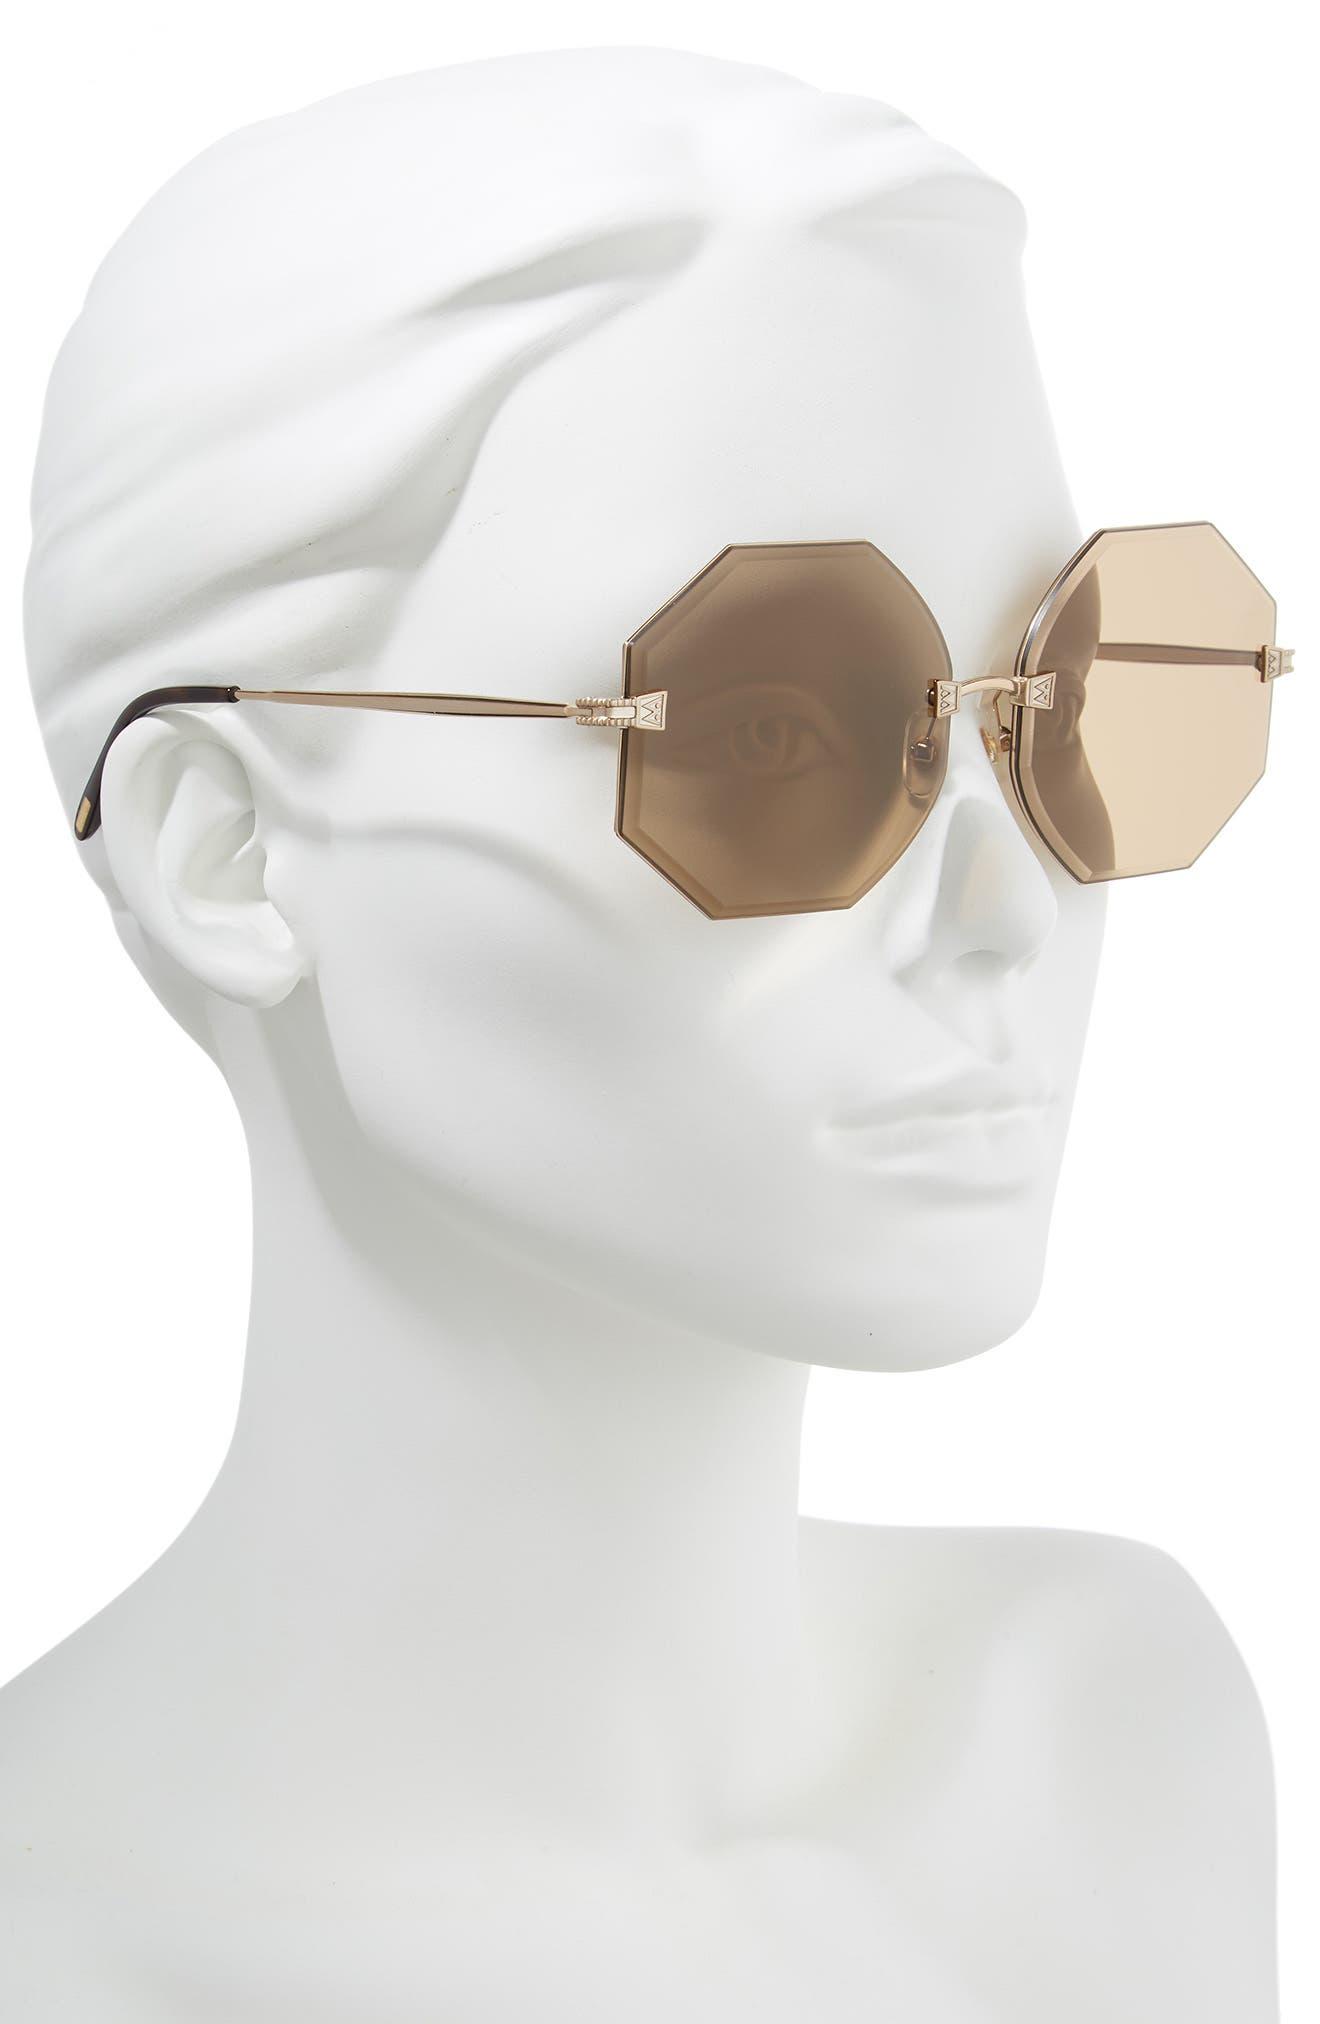 Gem 64mm Oversize Geometric Sunglasses,                             Alternate thumbnail 2, color,                             ANTIQUE GOLD/ BROWN SOLID